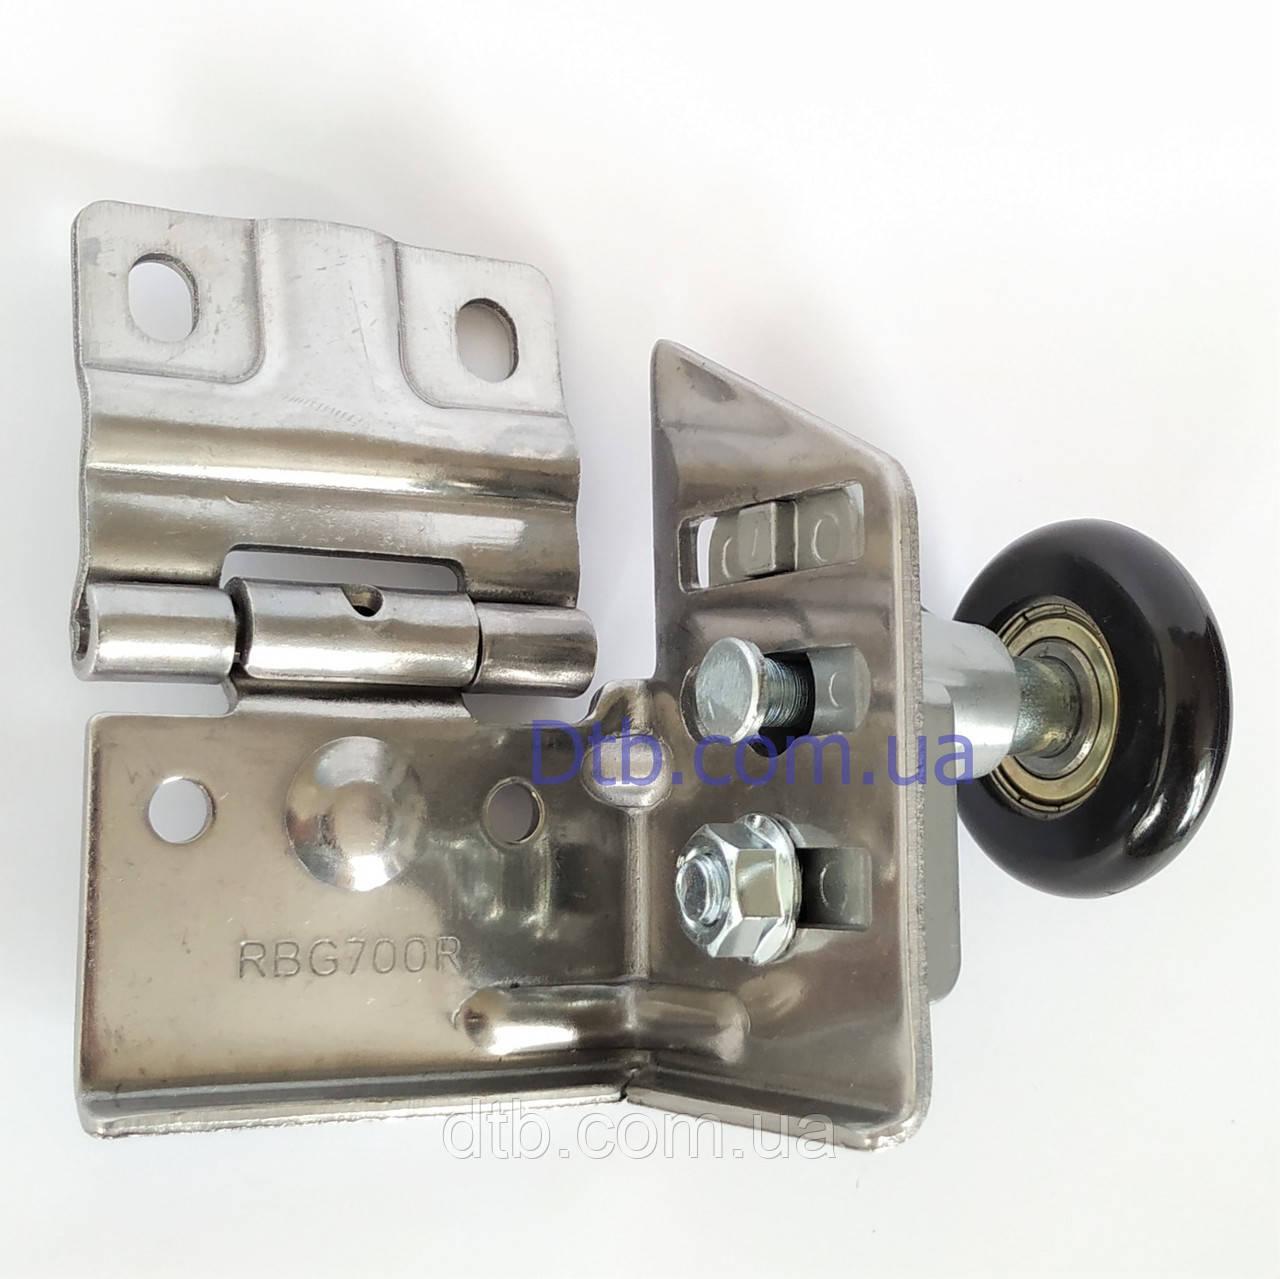 Кронштейн с роликом RBG700R-SS нержавеющий для ворот Alutech